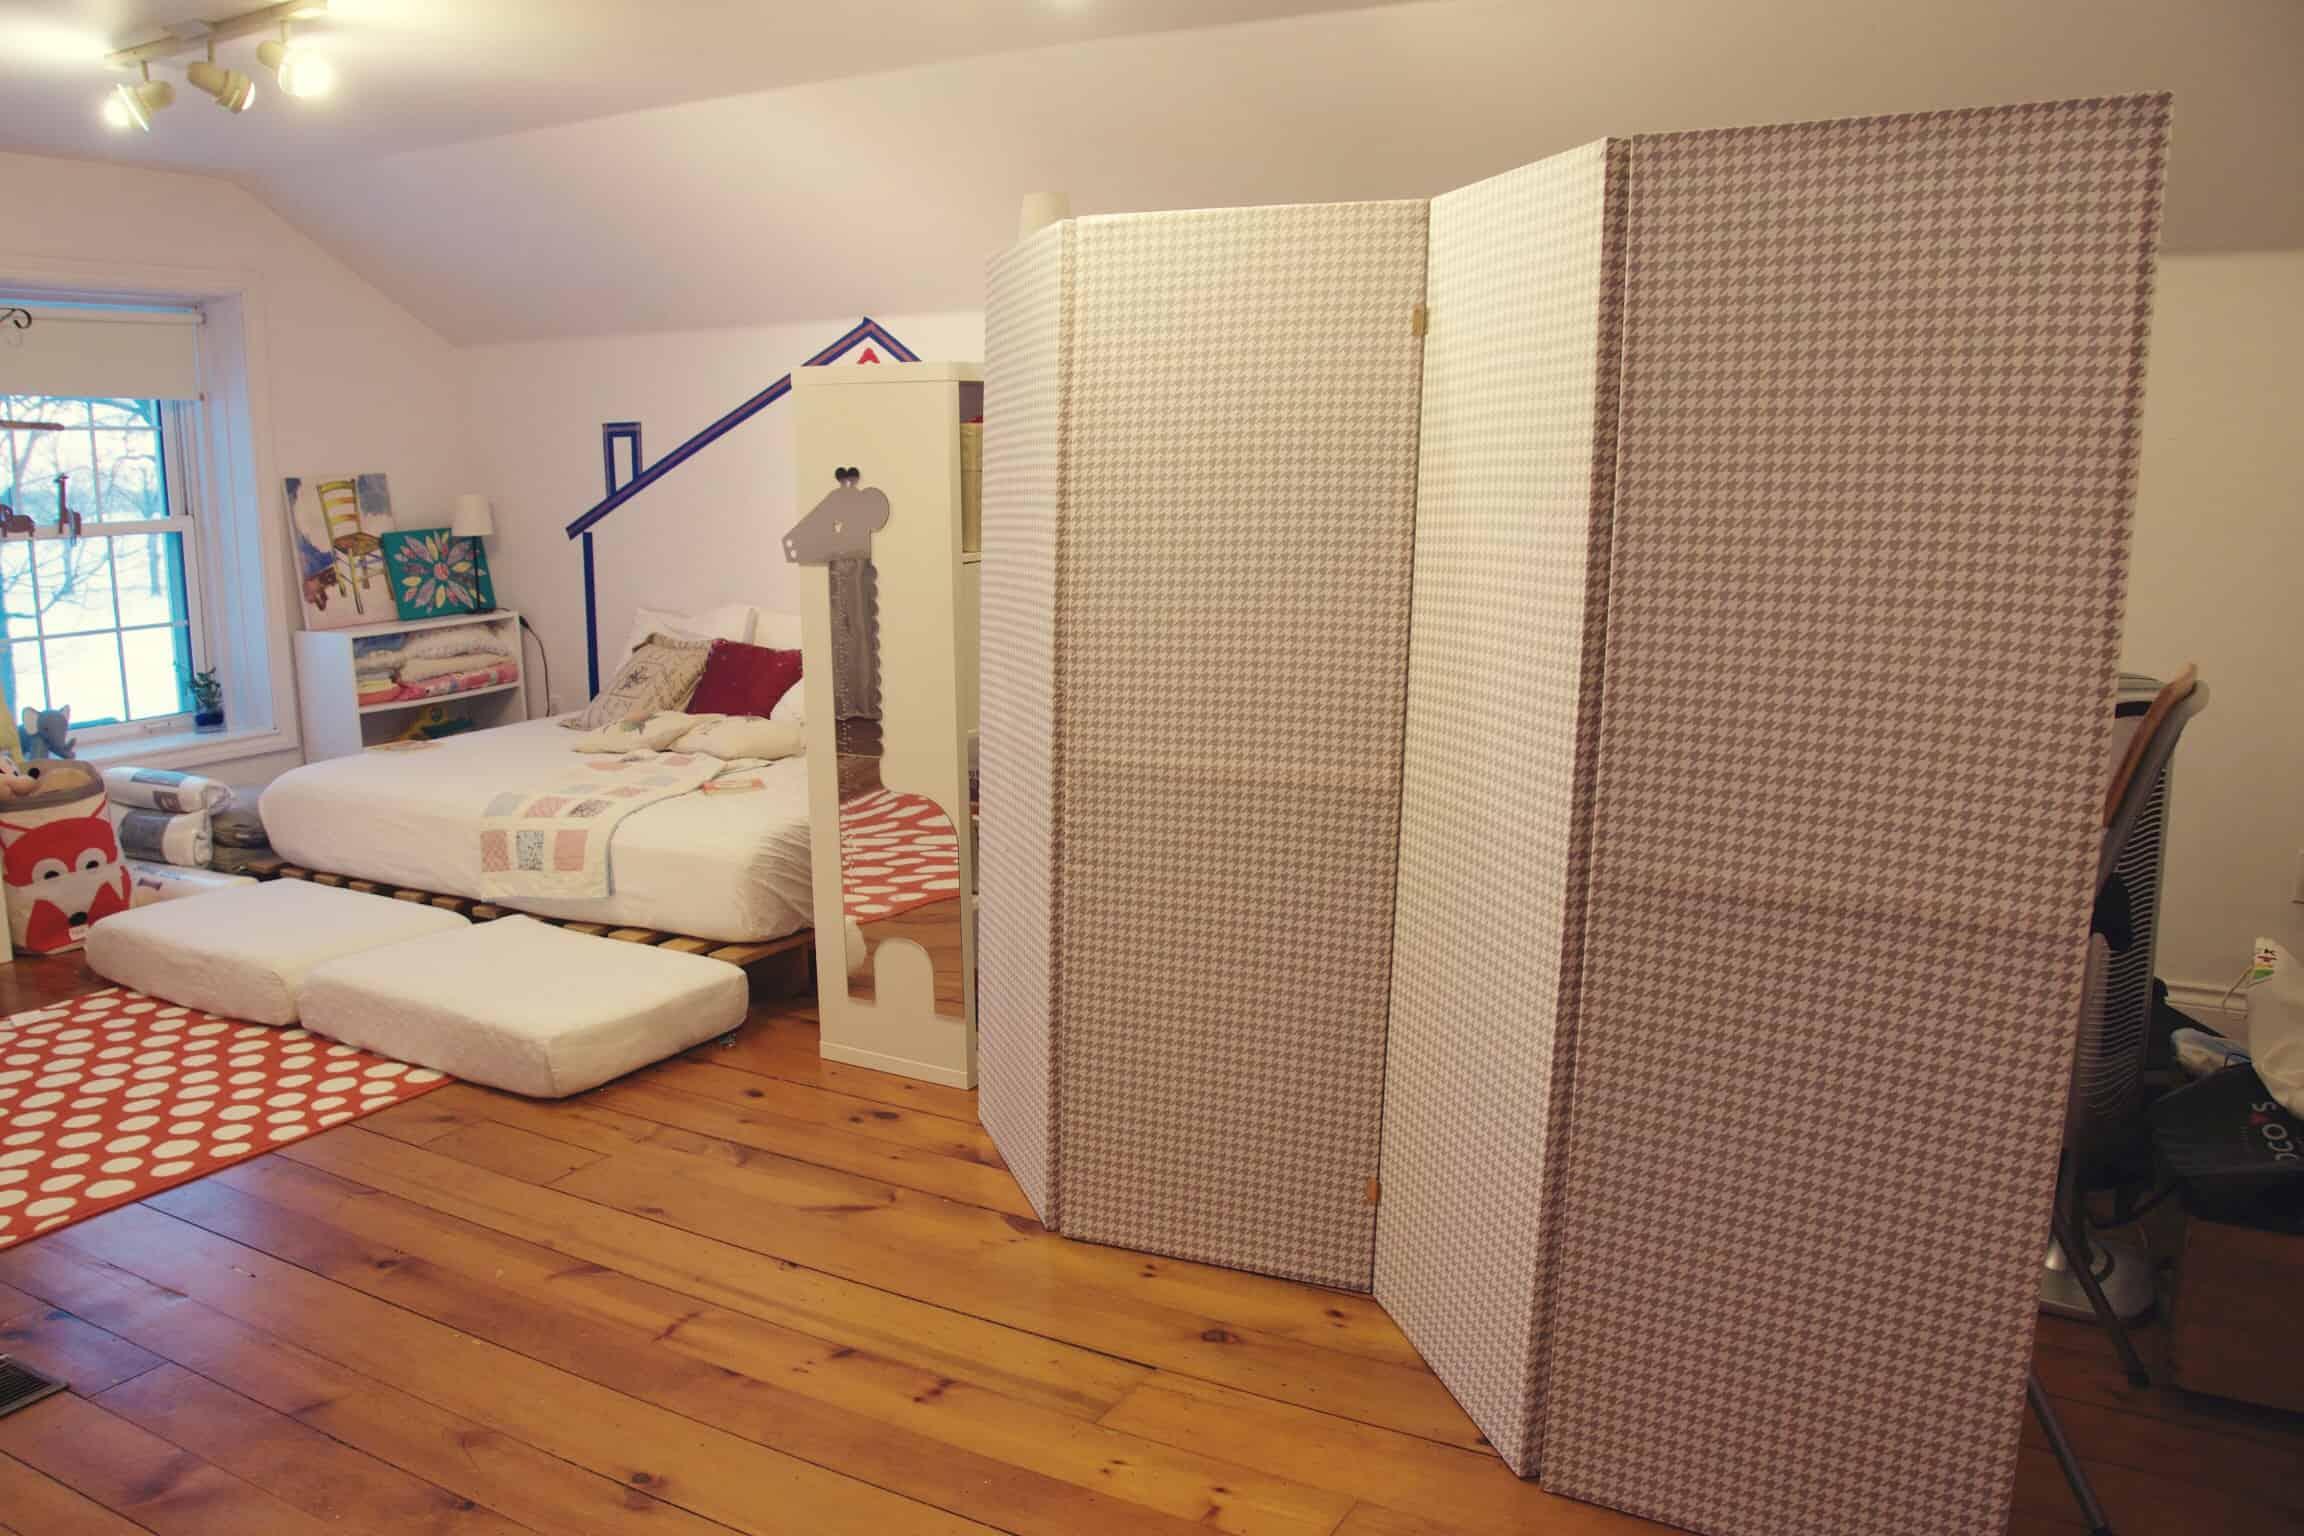 Pepita room divider